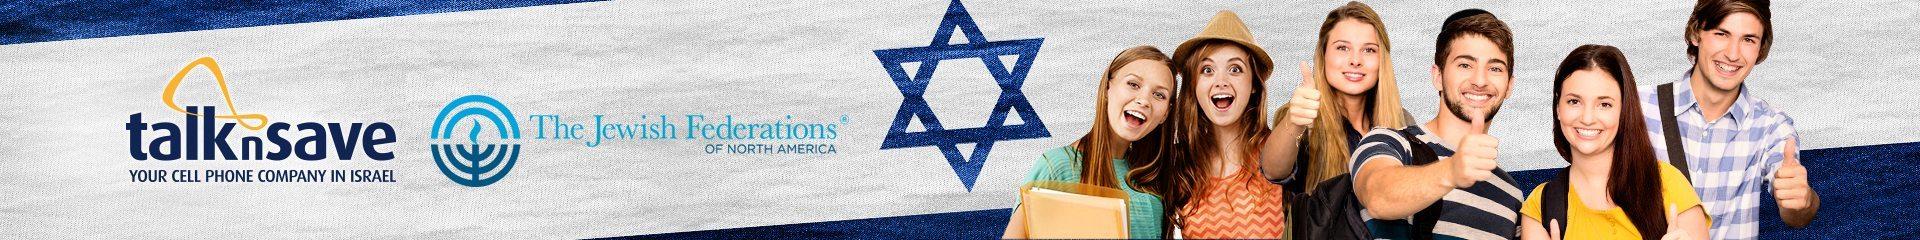 Jewish-Federations-Banner